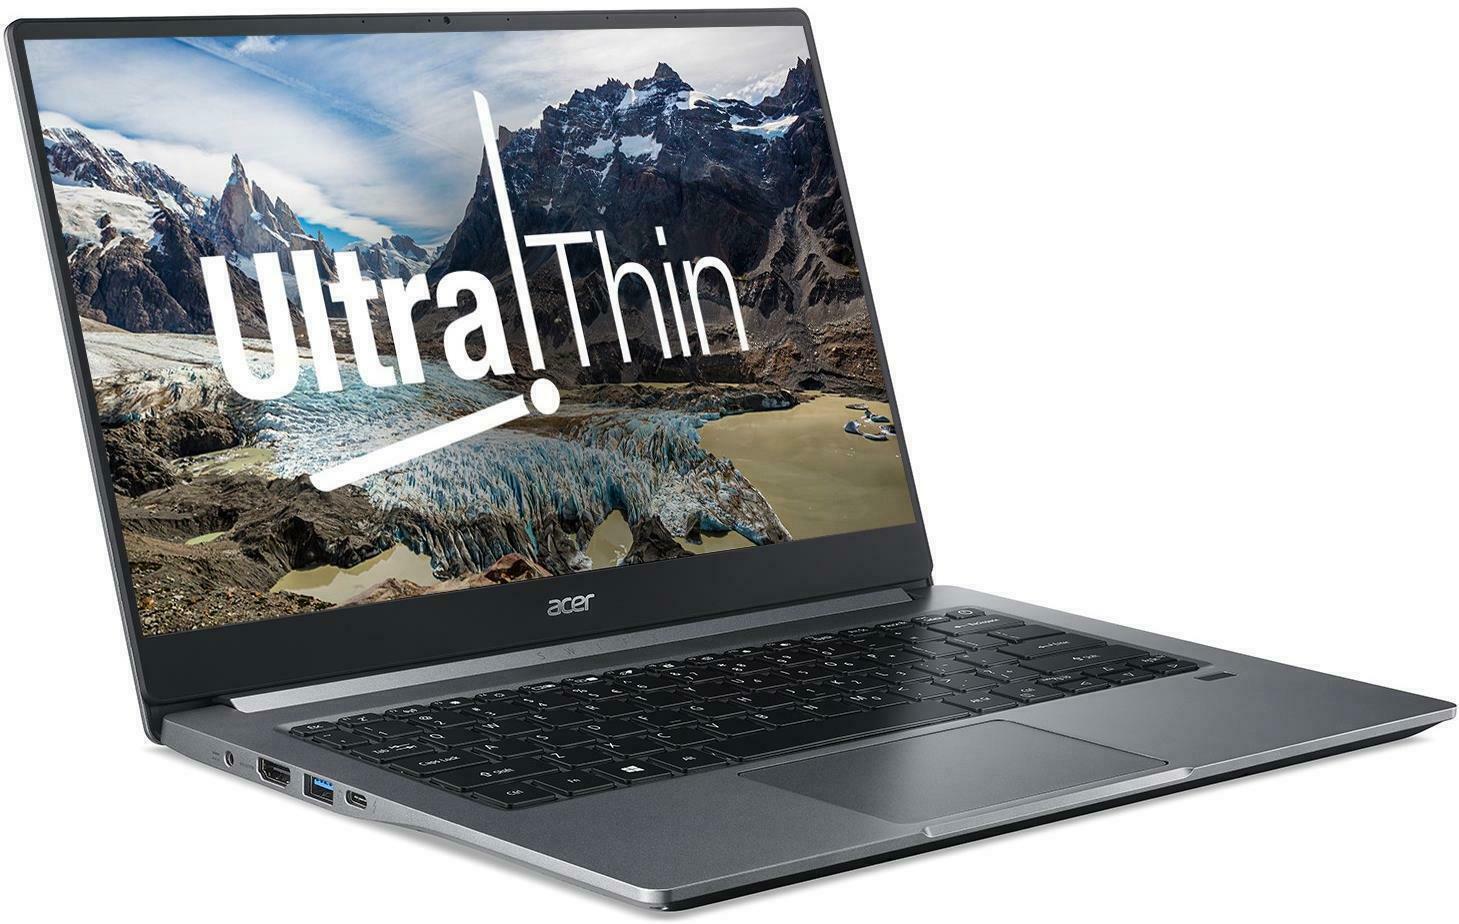 "Acer Swift 3 14"" Intel Core i7 1065G7/16GBRAM/512GB SSD/IrisPlus Graphics/FHD IPS Screen/Thunderbolt 3 Laptop £619.97 Using Code @ Box/eBay"